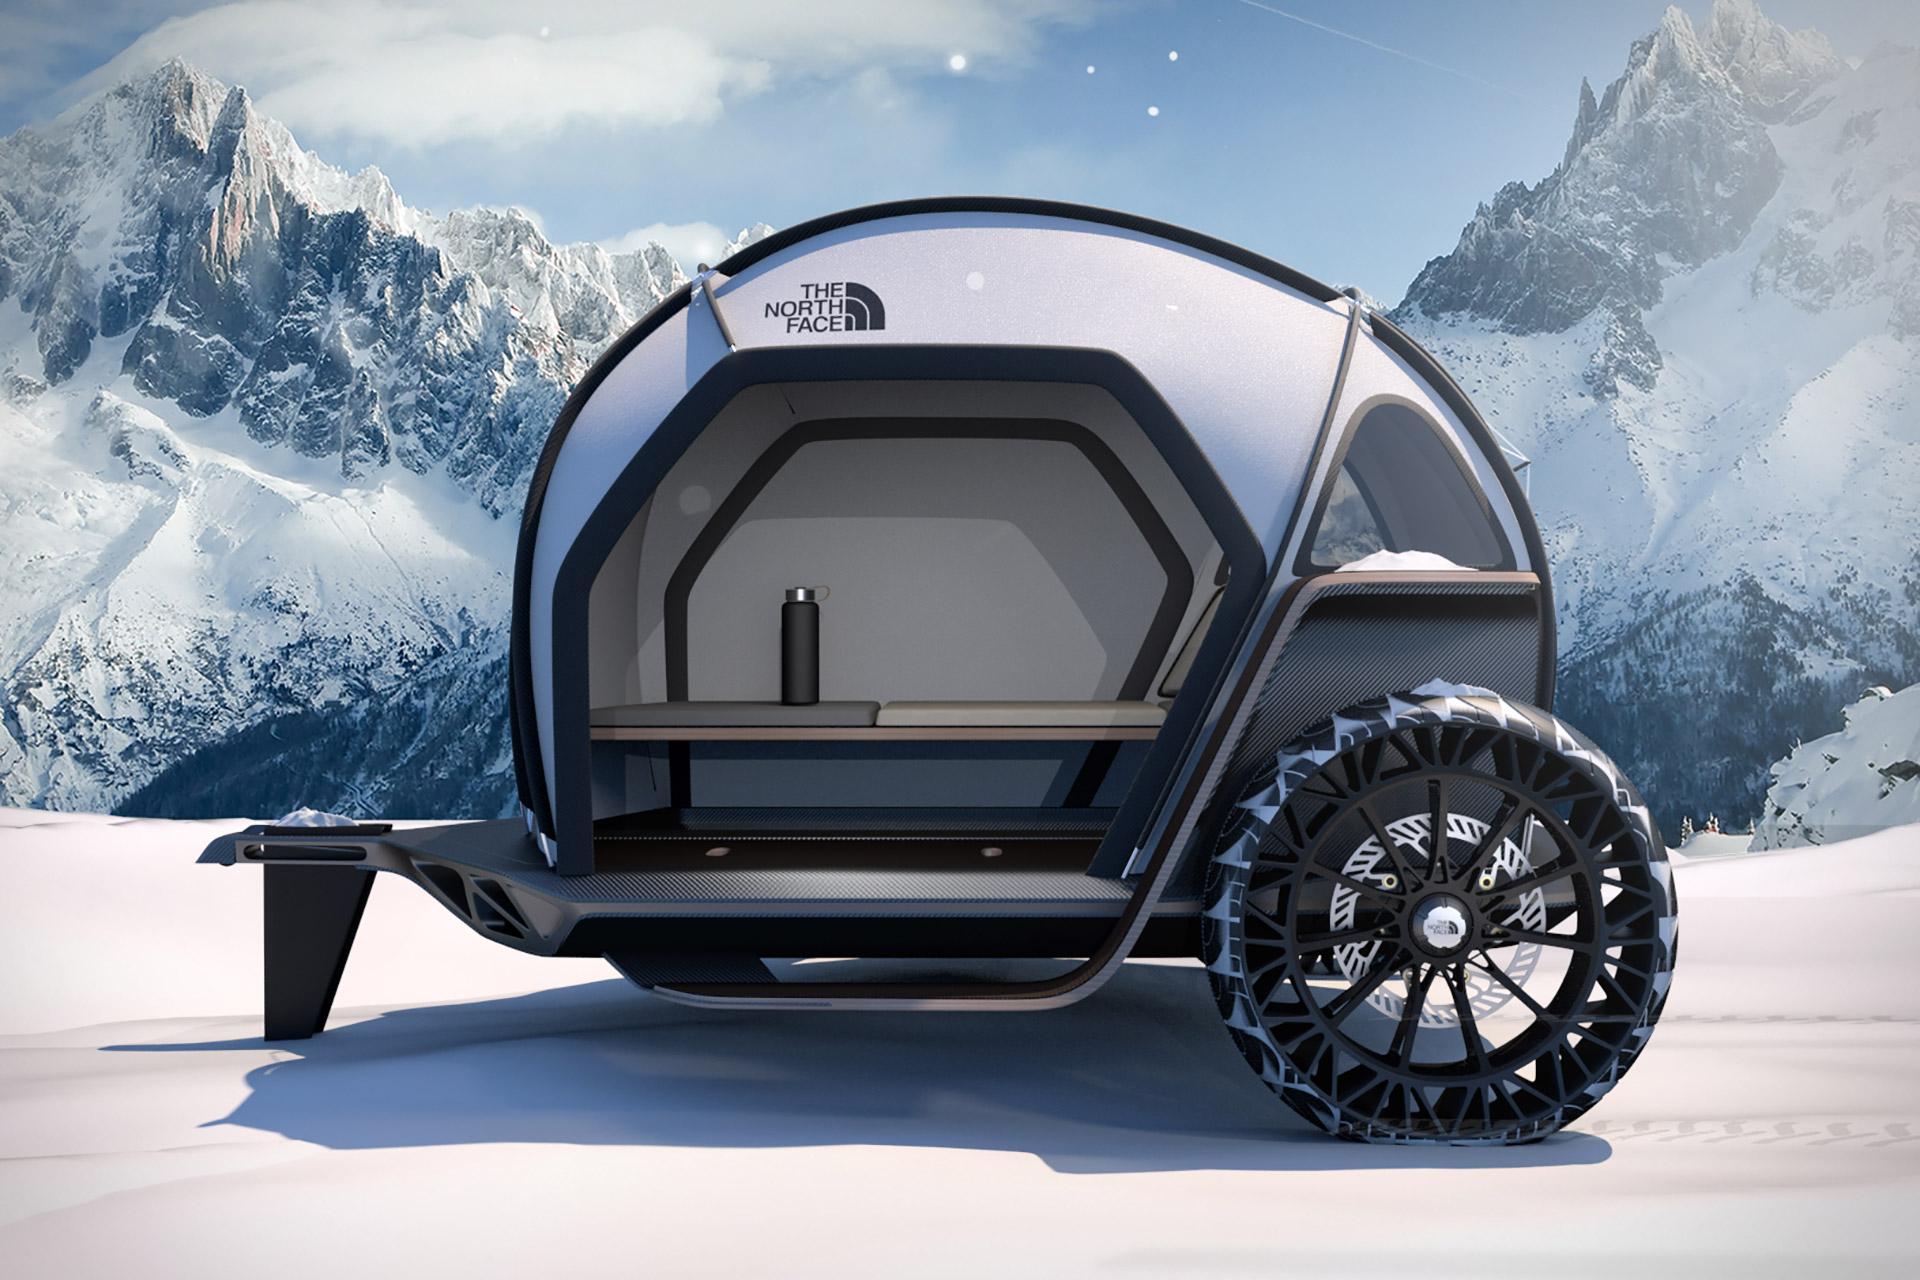 BMW Designworks x The North Face Camper Concept